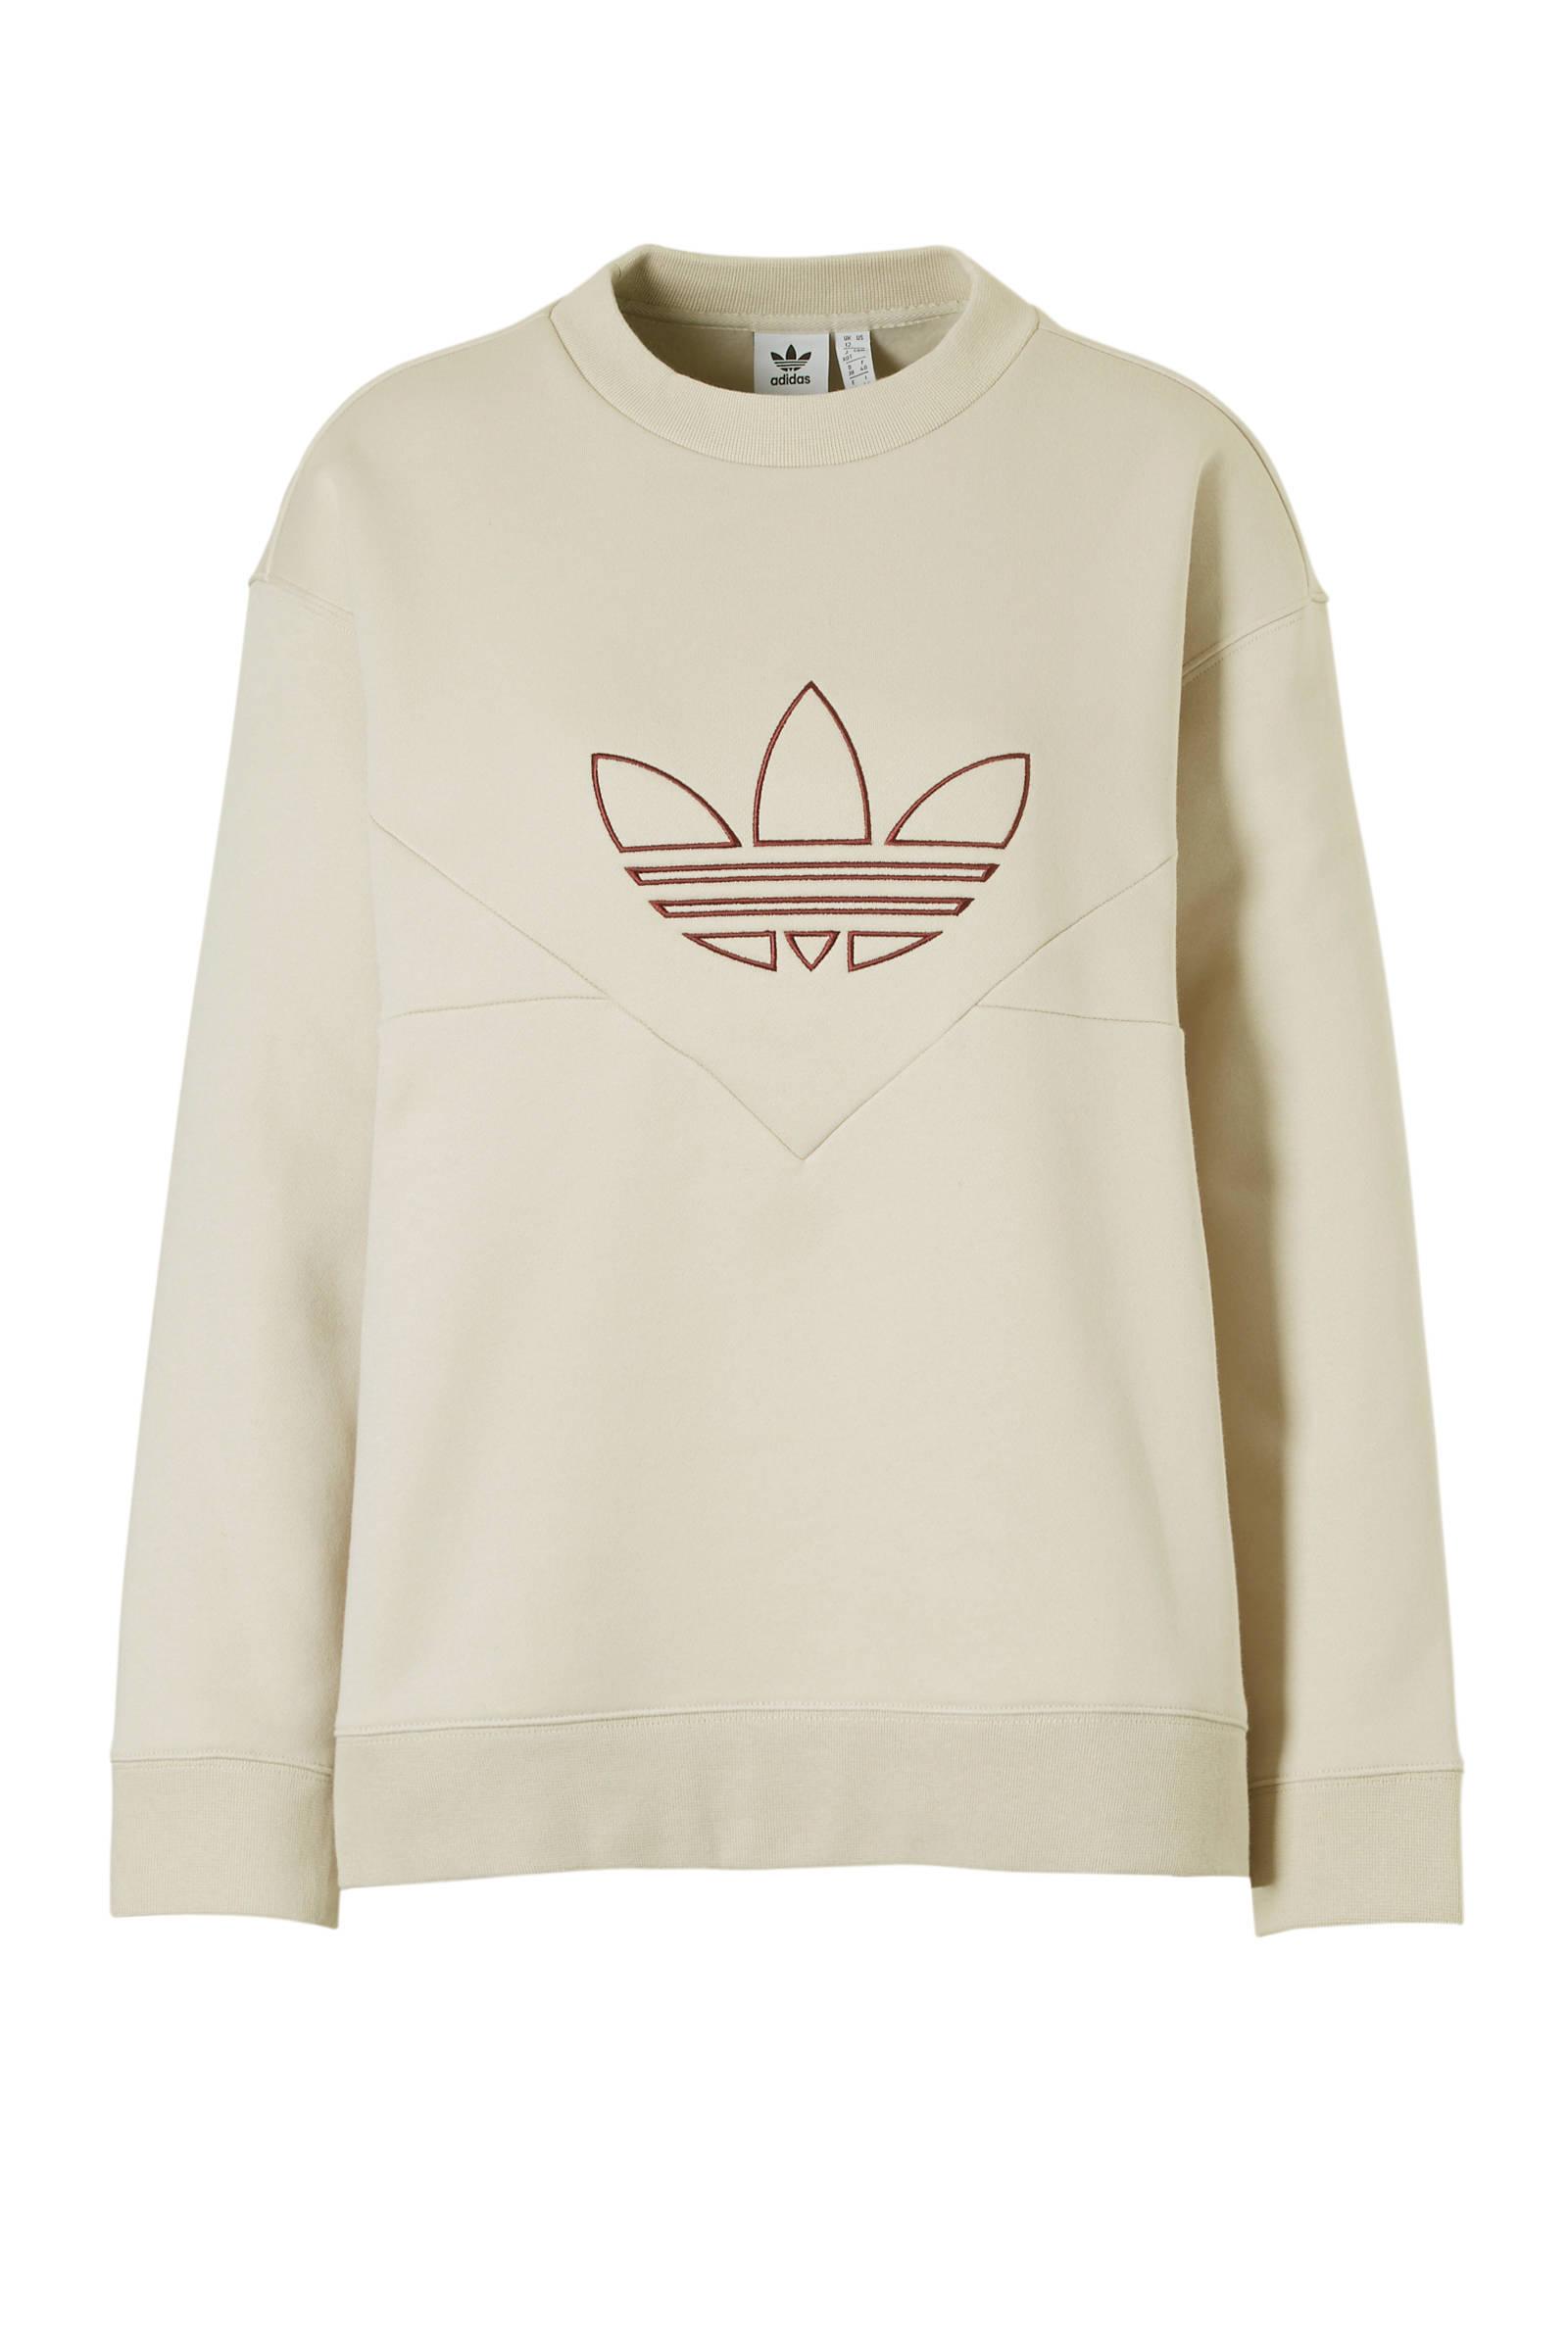 adidas originals adidas Originals sweater   wehkamp